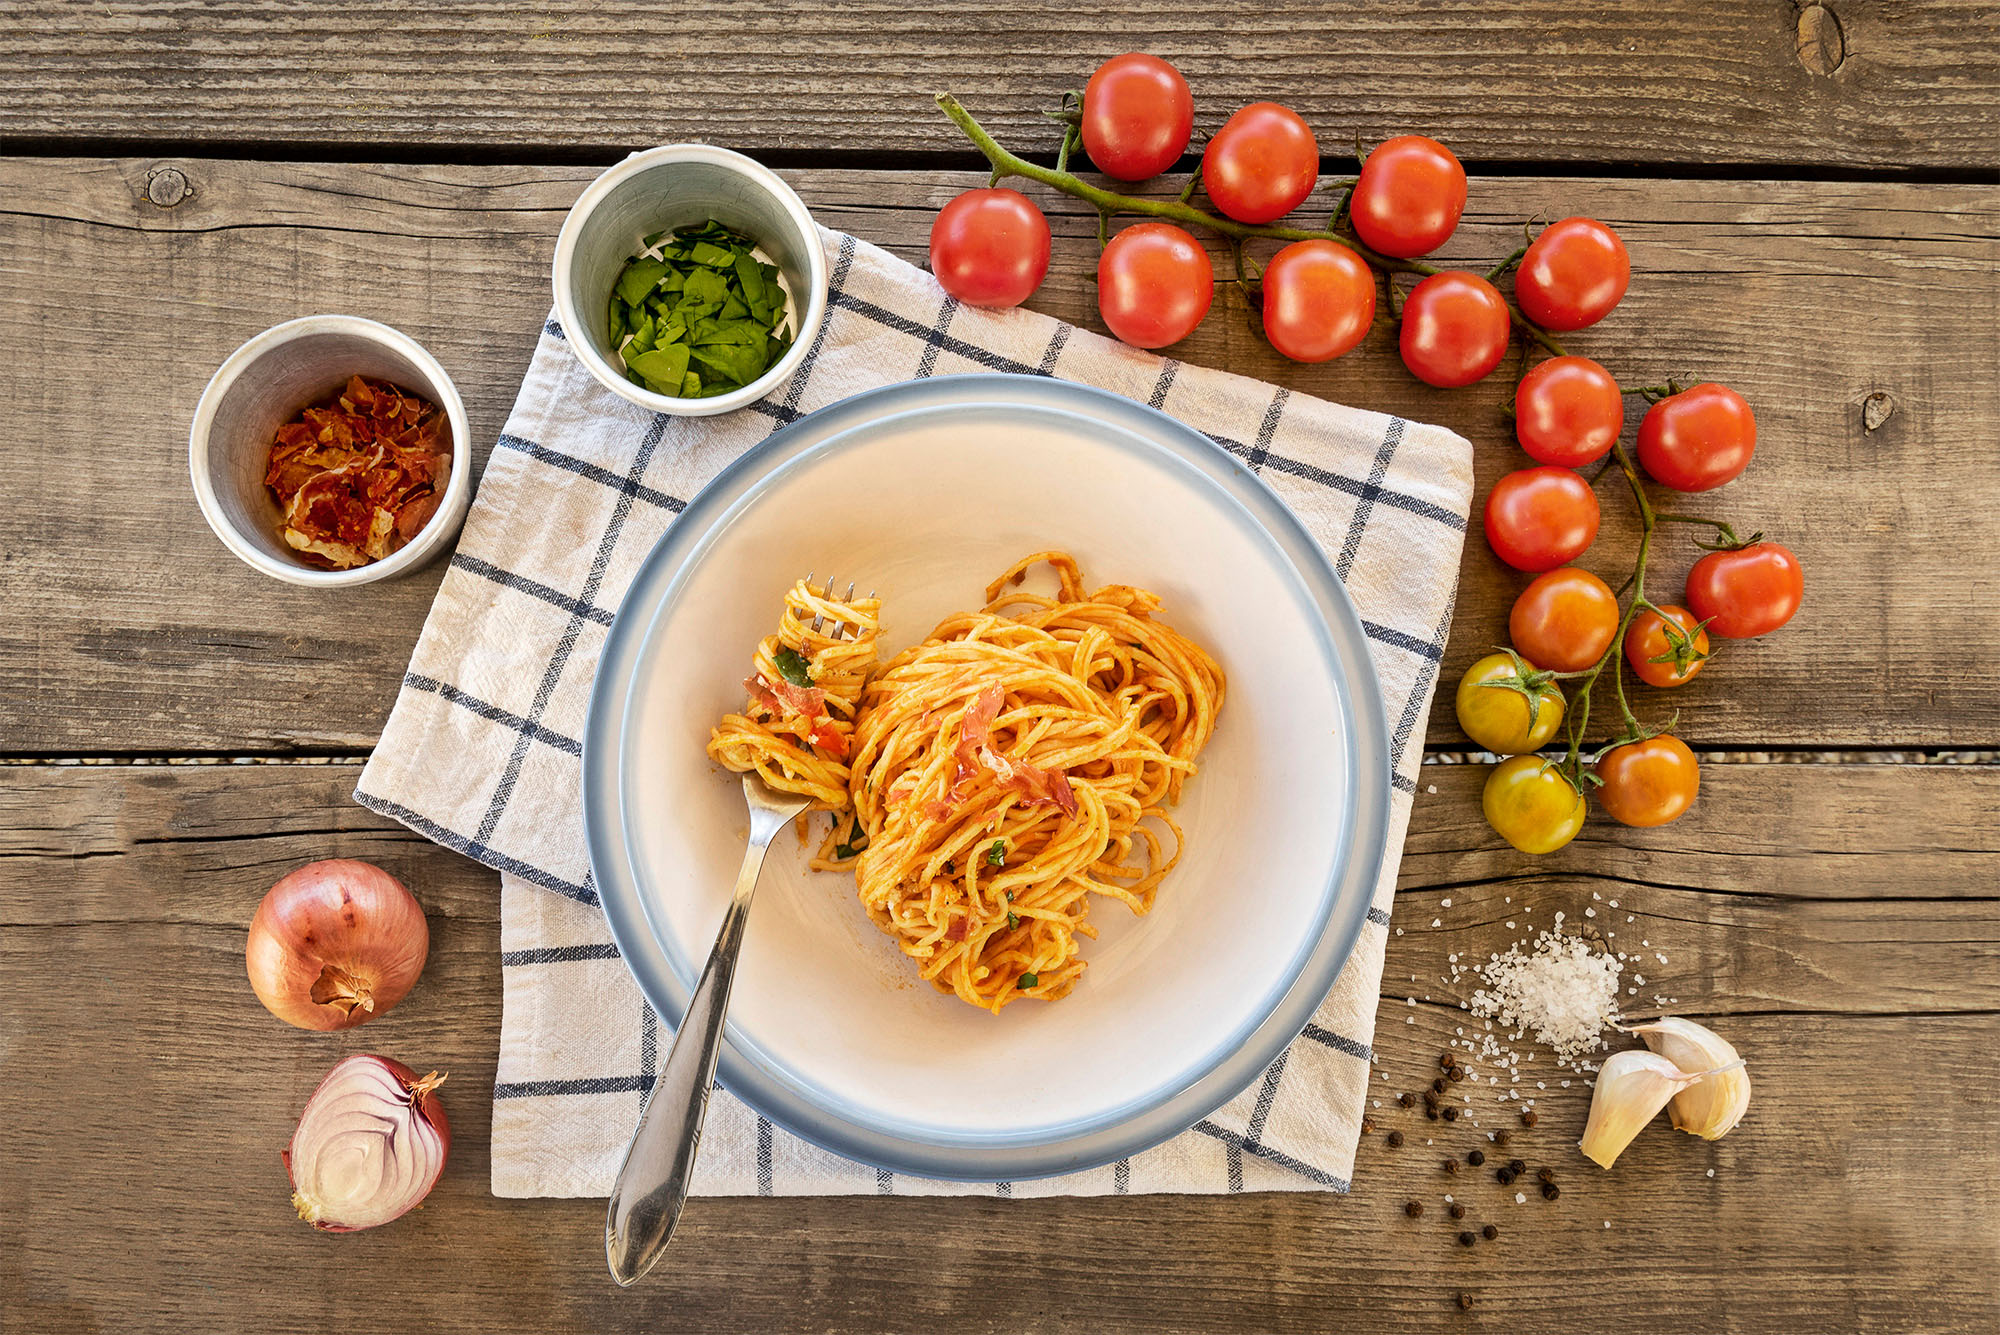 Agriturismo Parco del Grep - Monferrato, Piemonte - La cucina alla Locanda del Grep